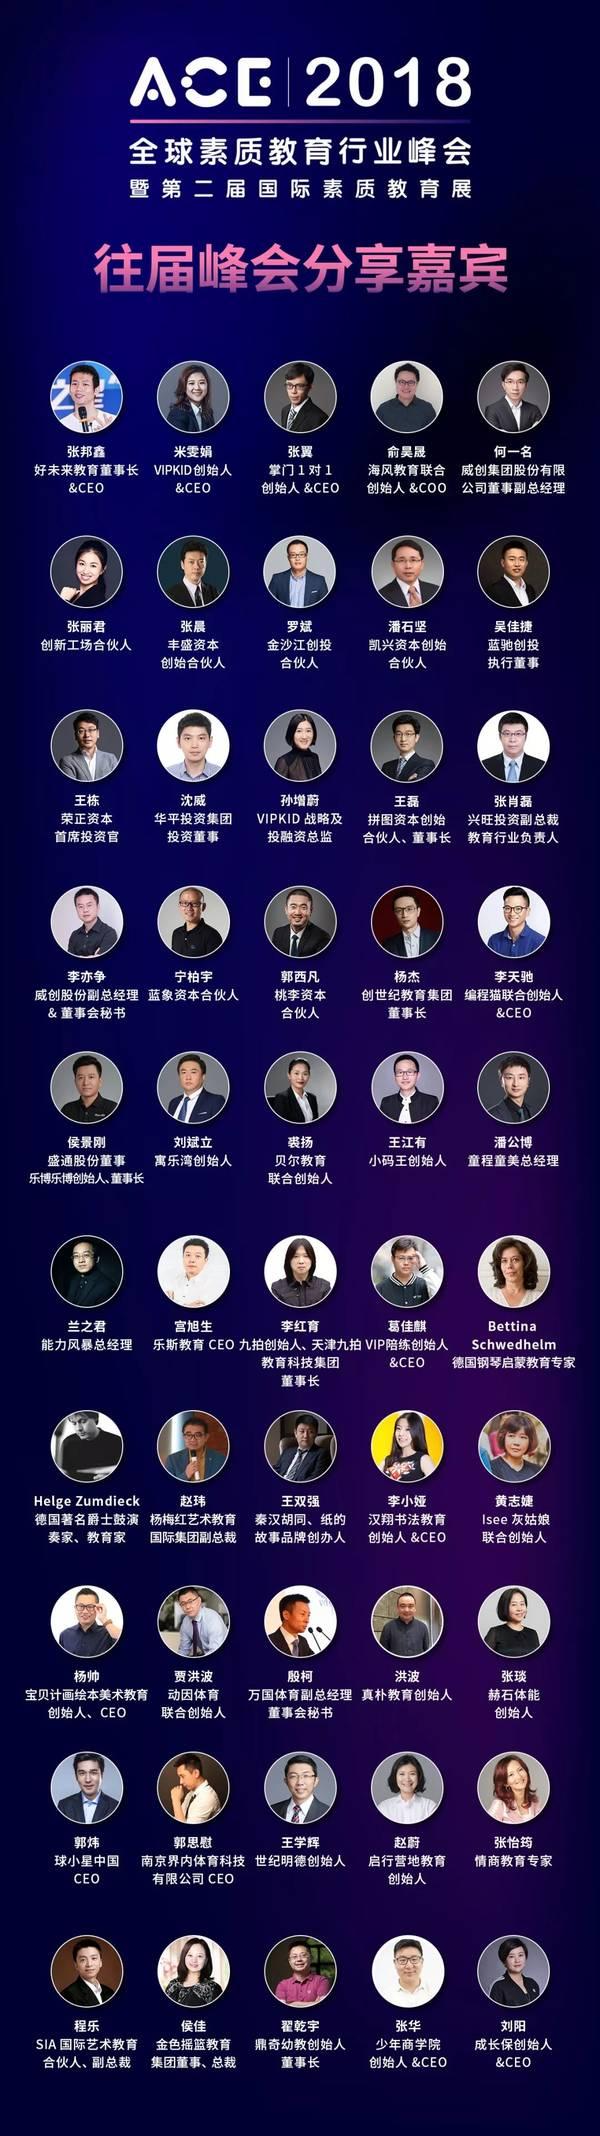 ACE 2018全球素质教育行业峰会